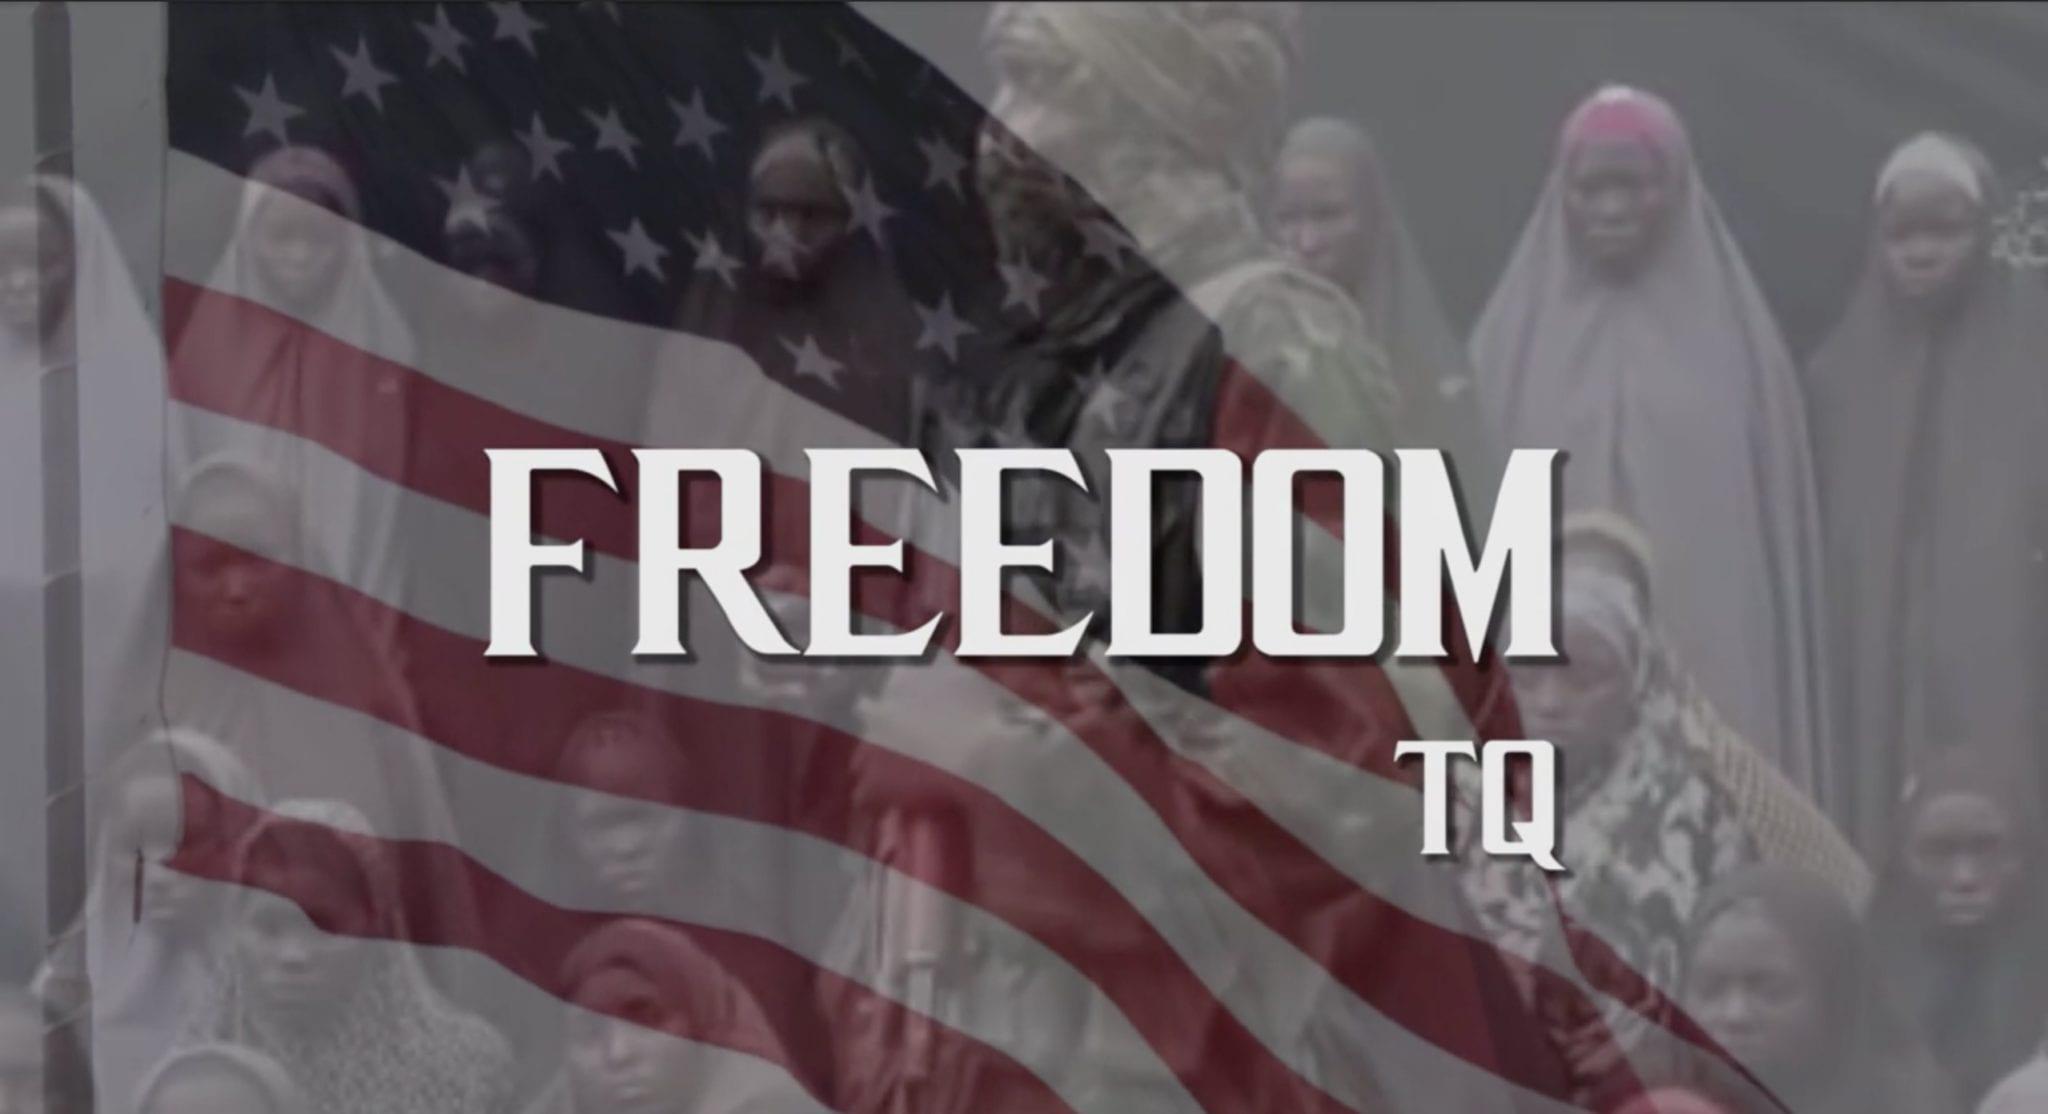 Freedom Music Video